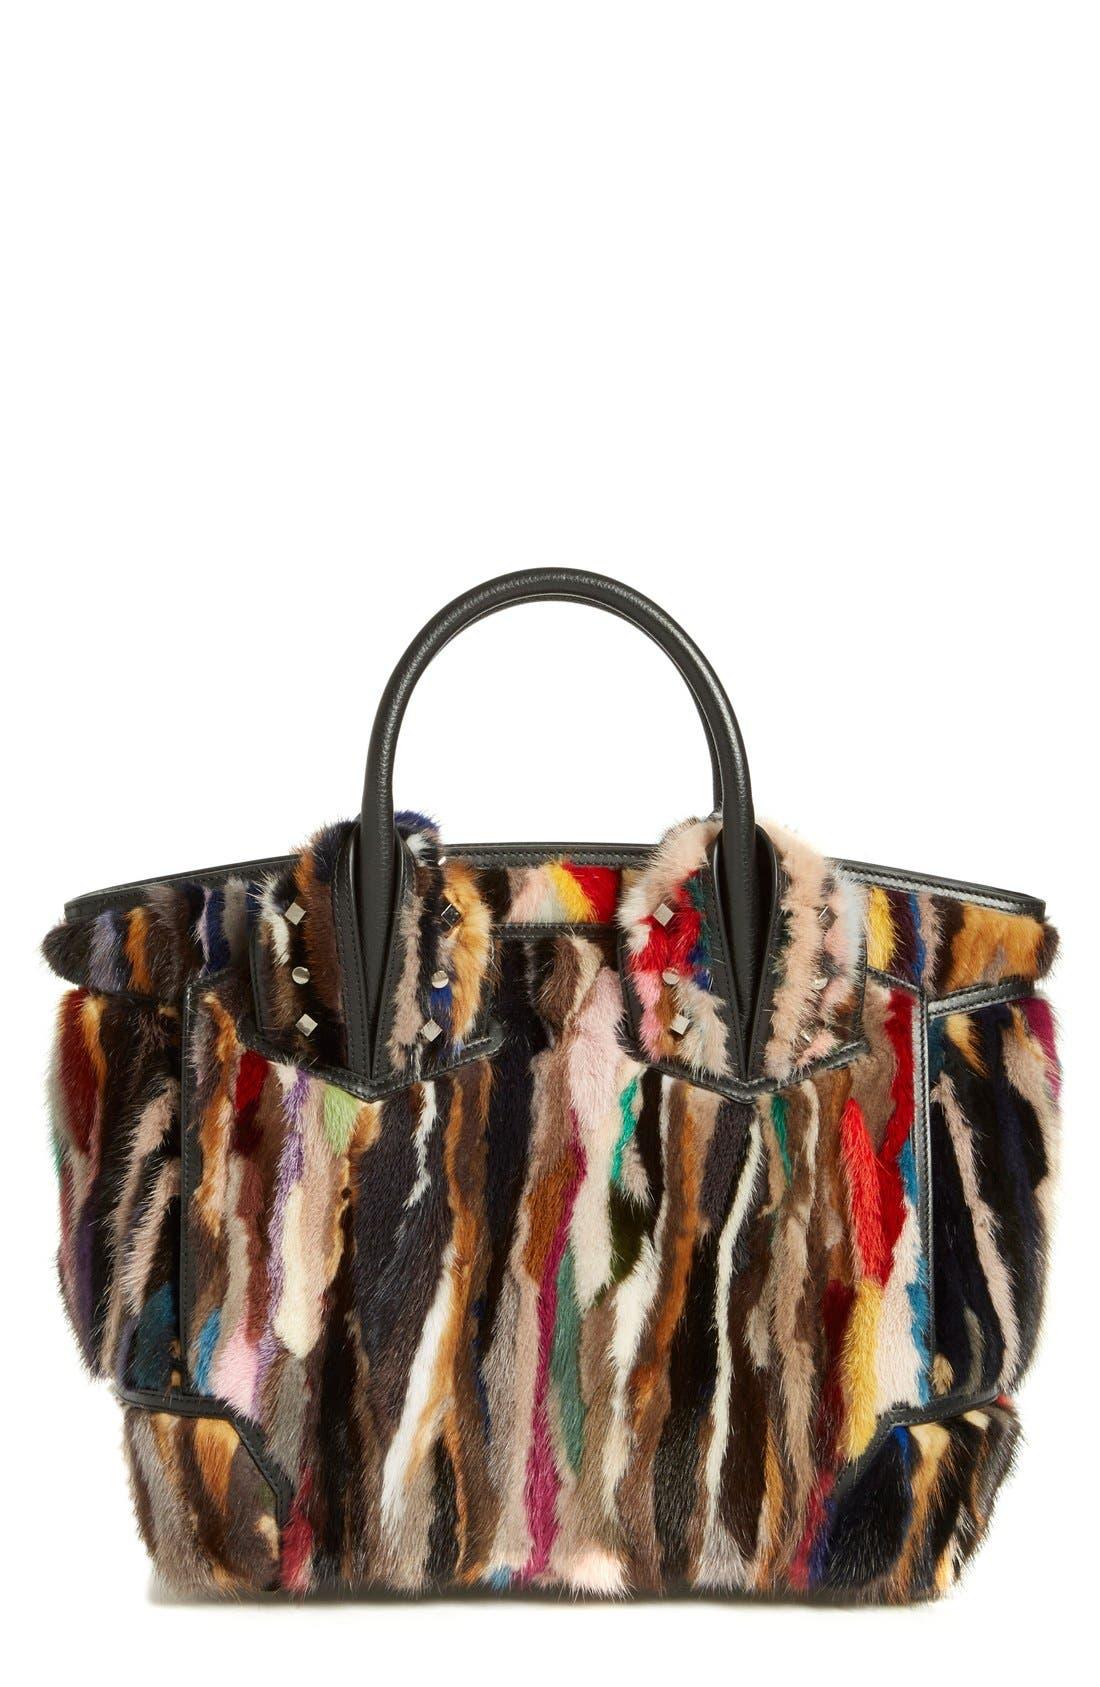 CHRISTIAN LOUBOUTIN 'Large Eloise' Studded Leather & Genuine Mink Fur Satchel, Main, color, 002